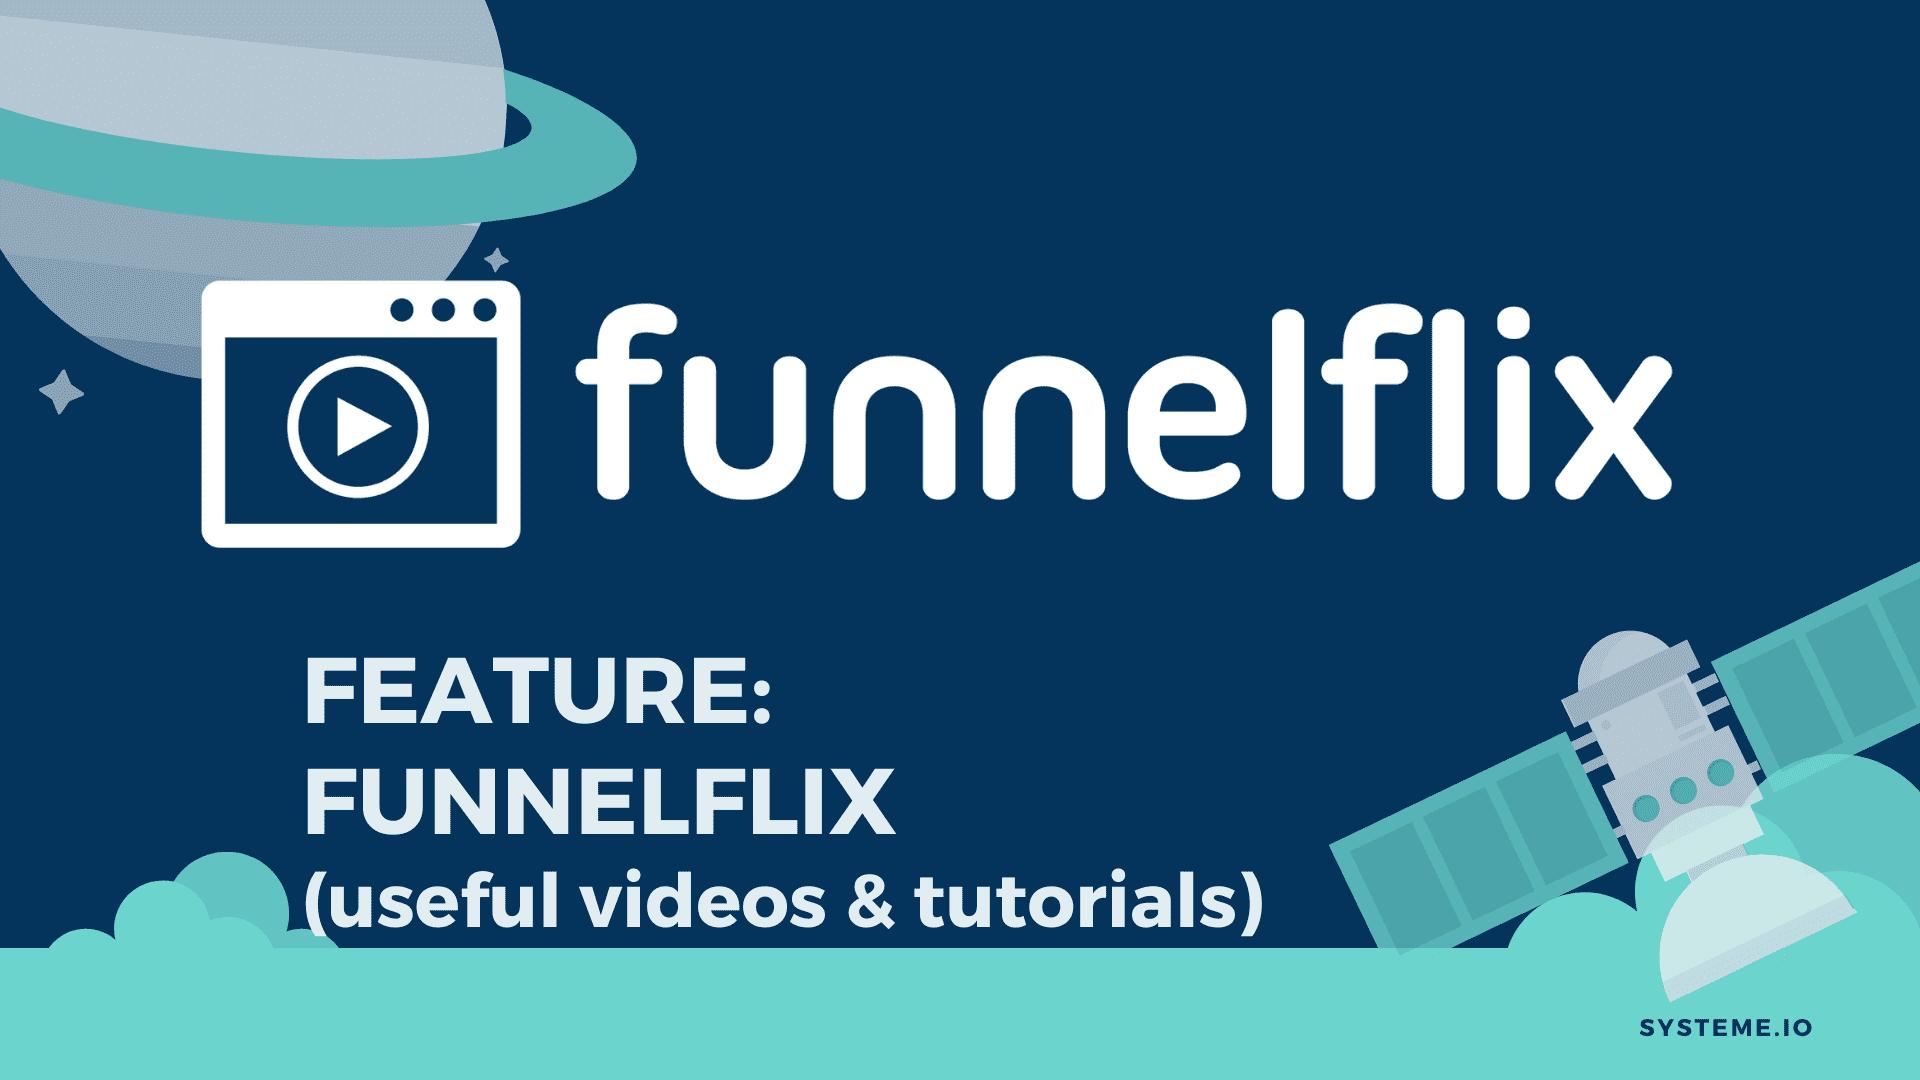 FunnelFlix